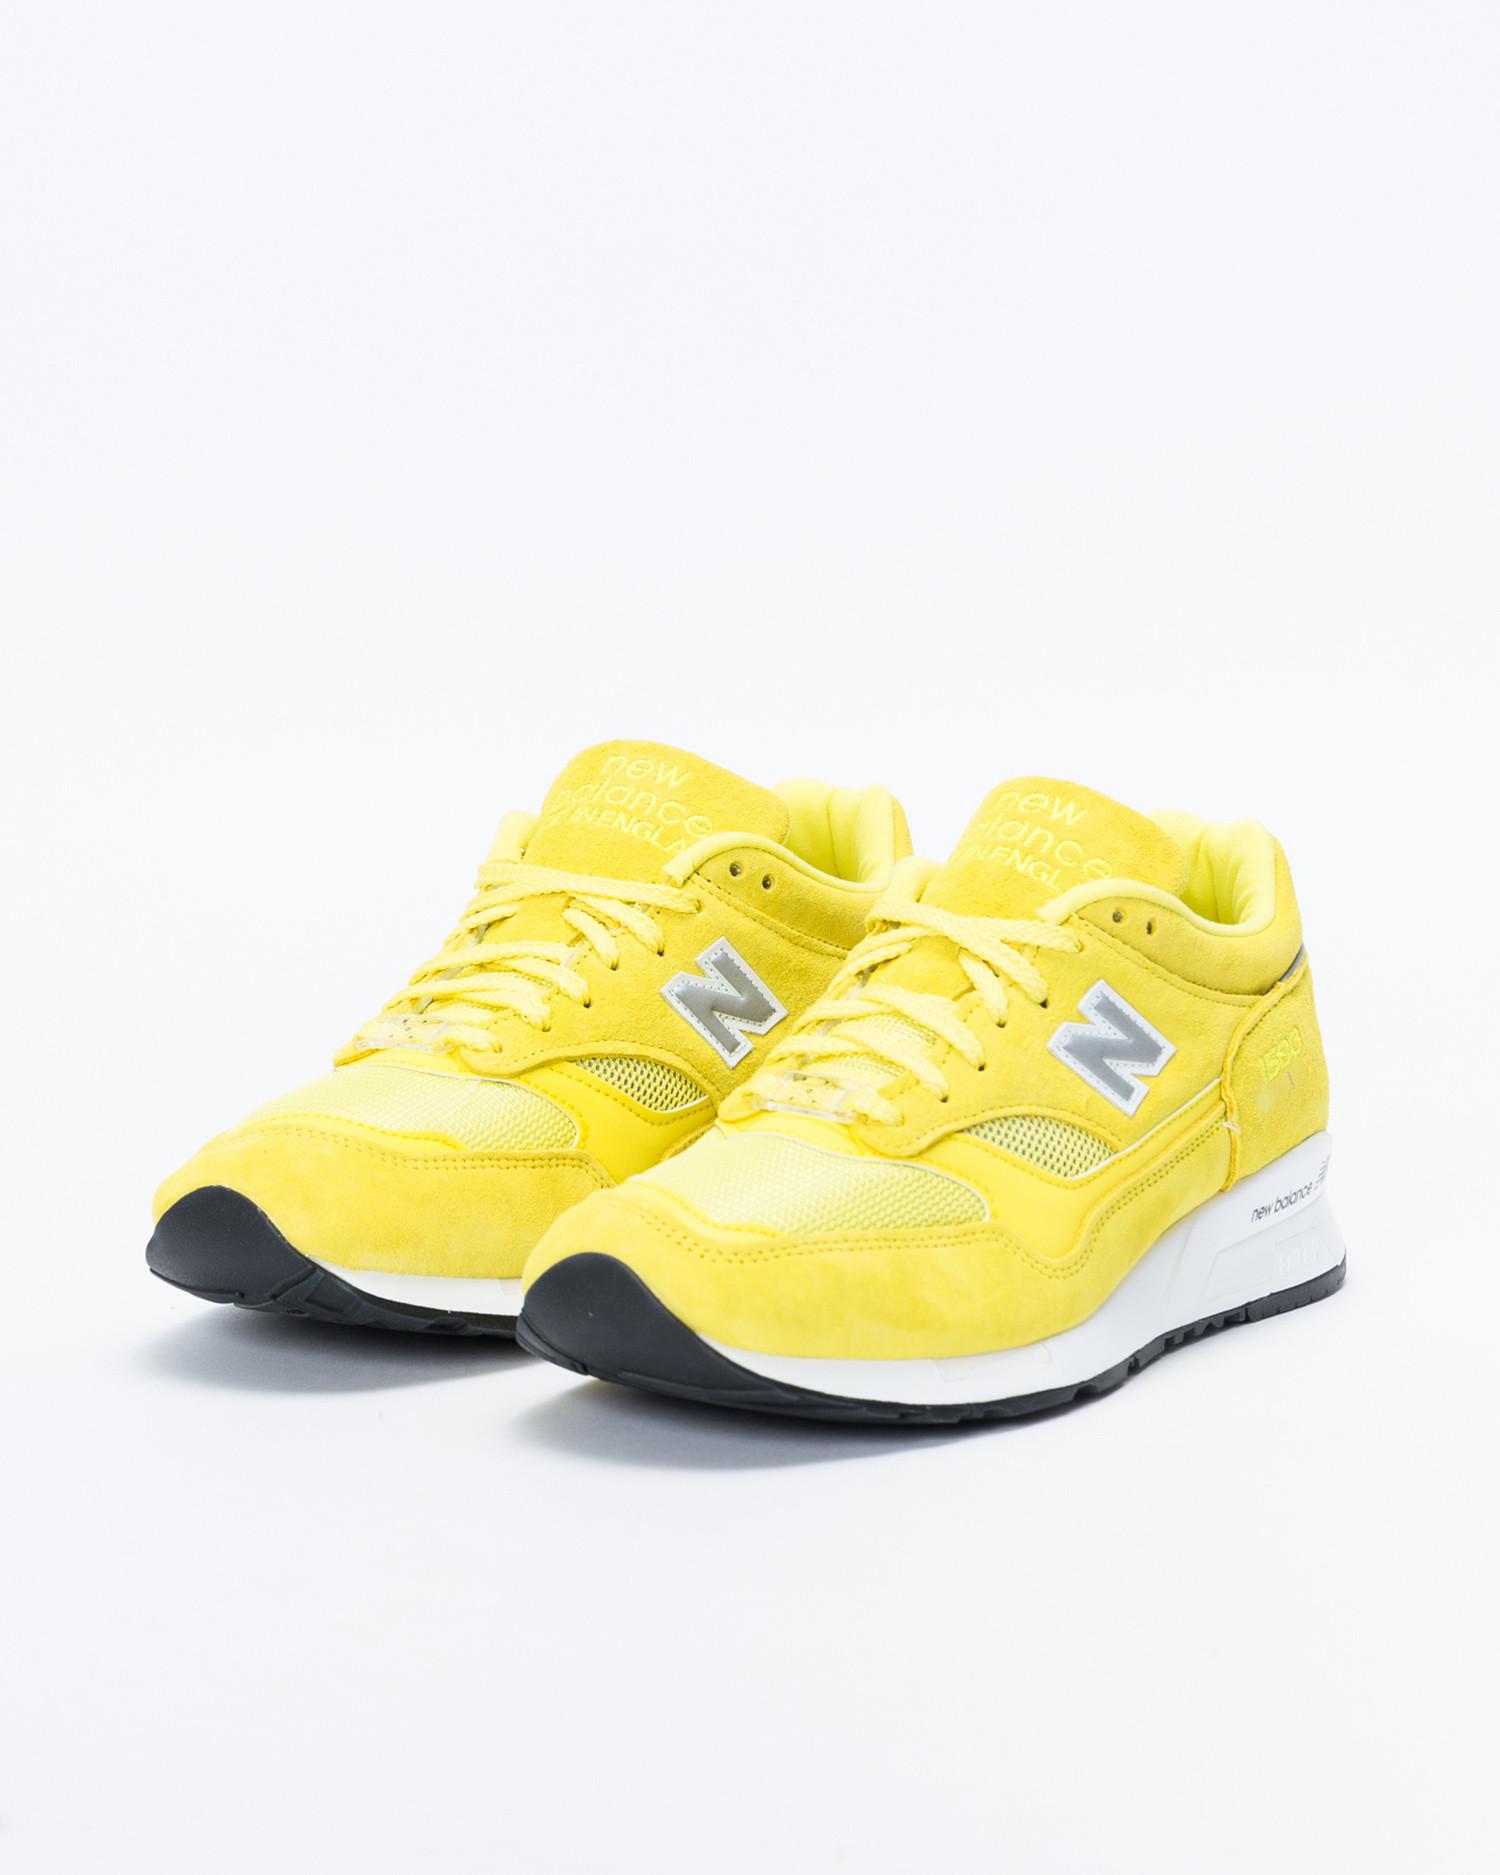 New Balance x Pop Trading Co M1500 Electric Yellow